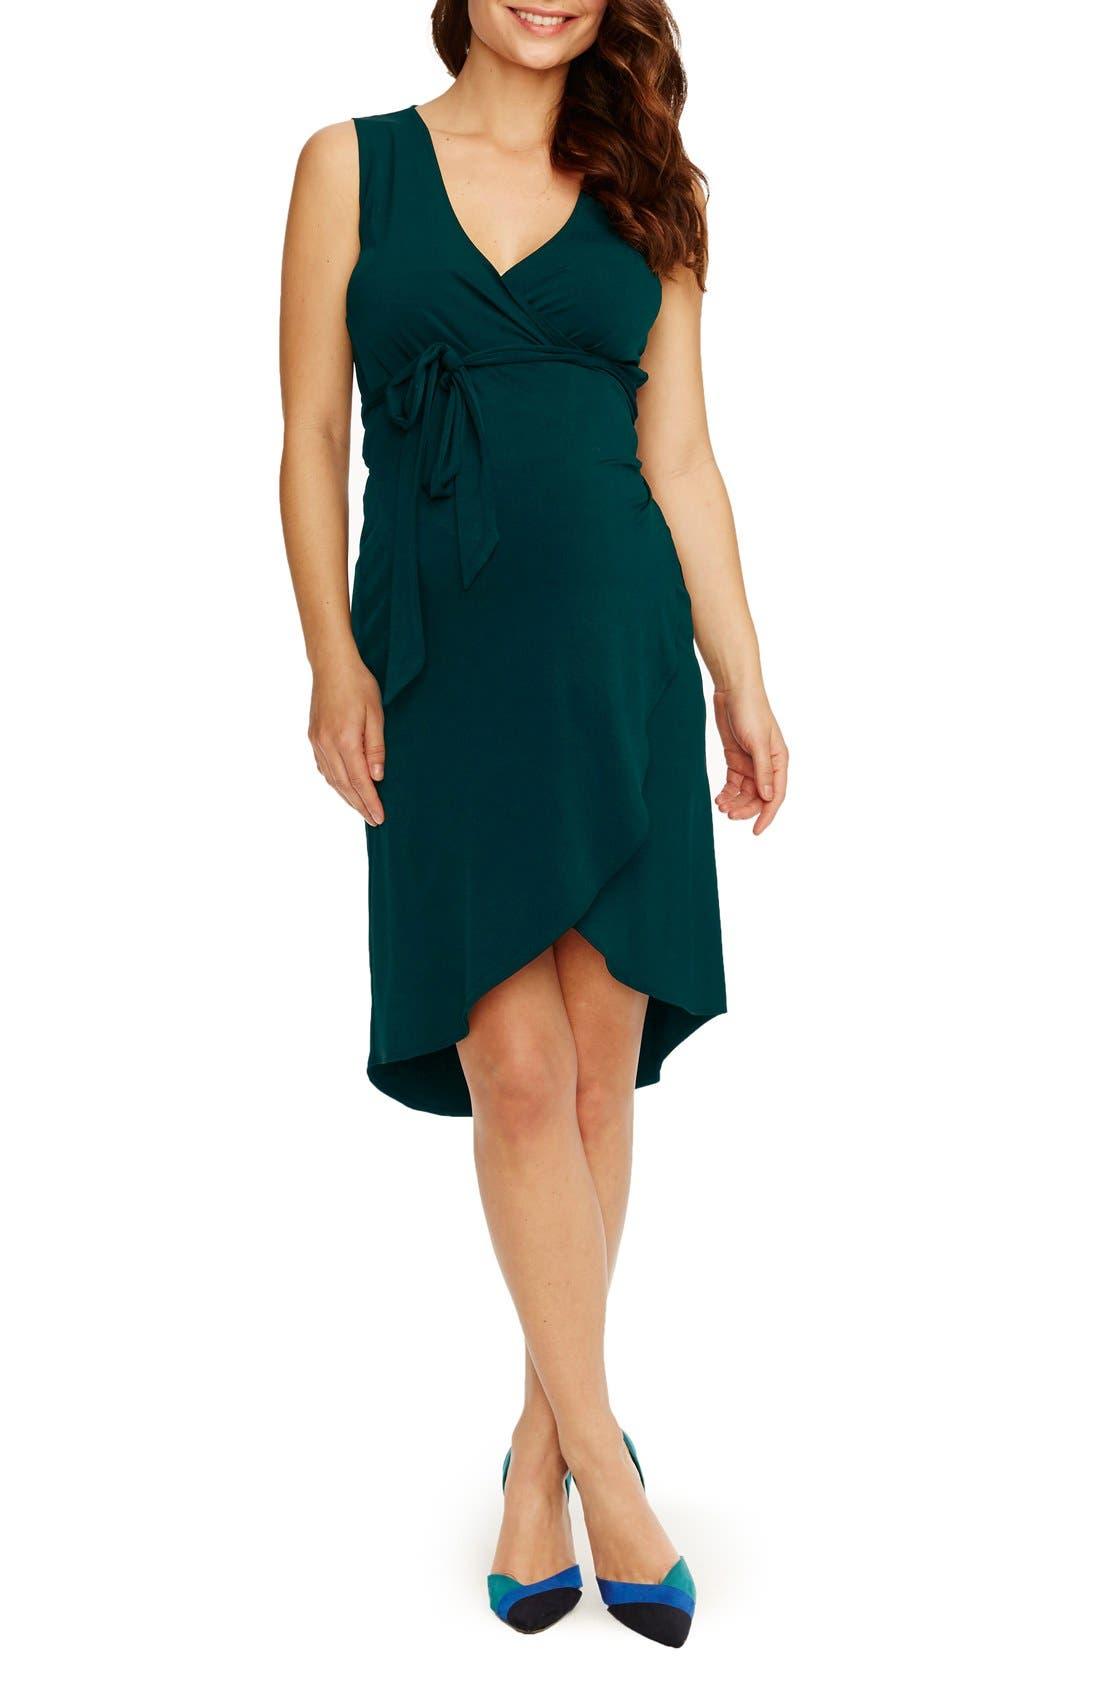 Rosie Pope 'Calla' Maternity Dress